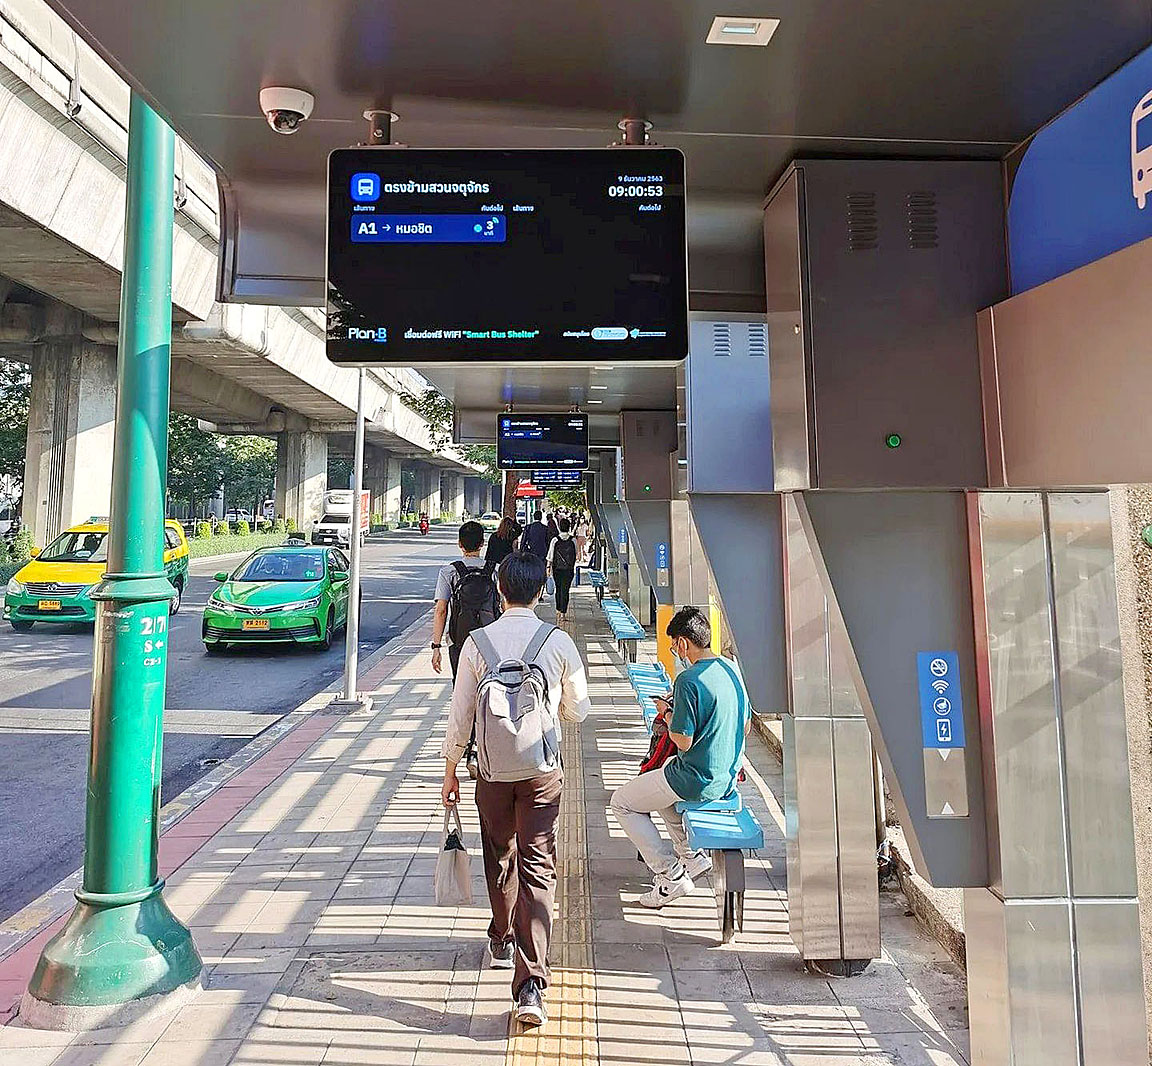 Bangkok New Bus Stop 03.jpg